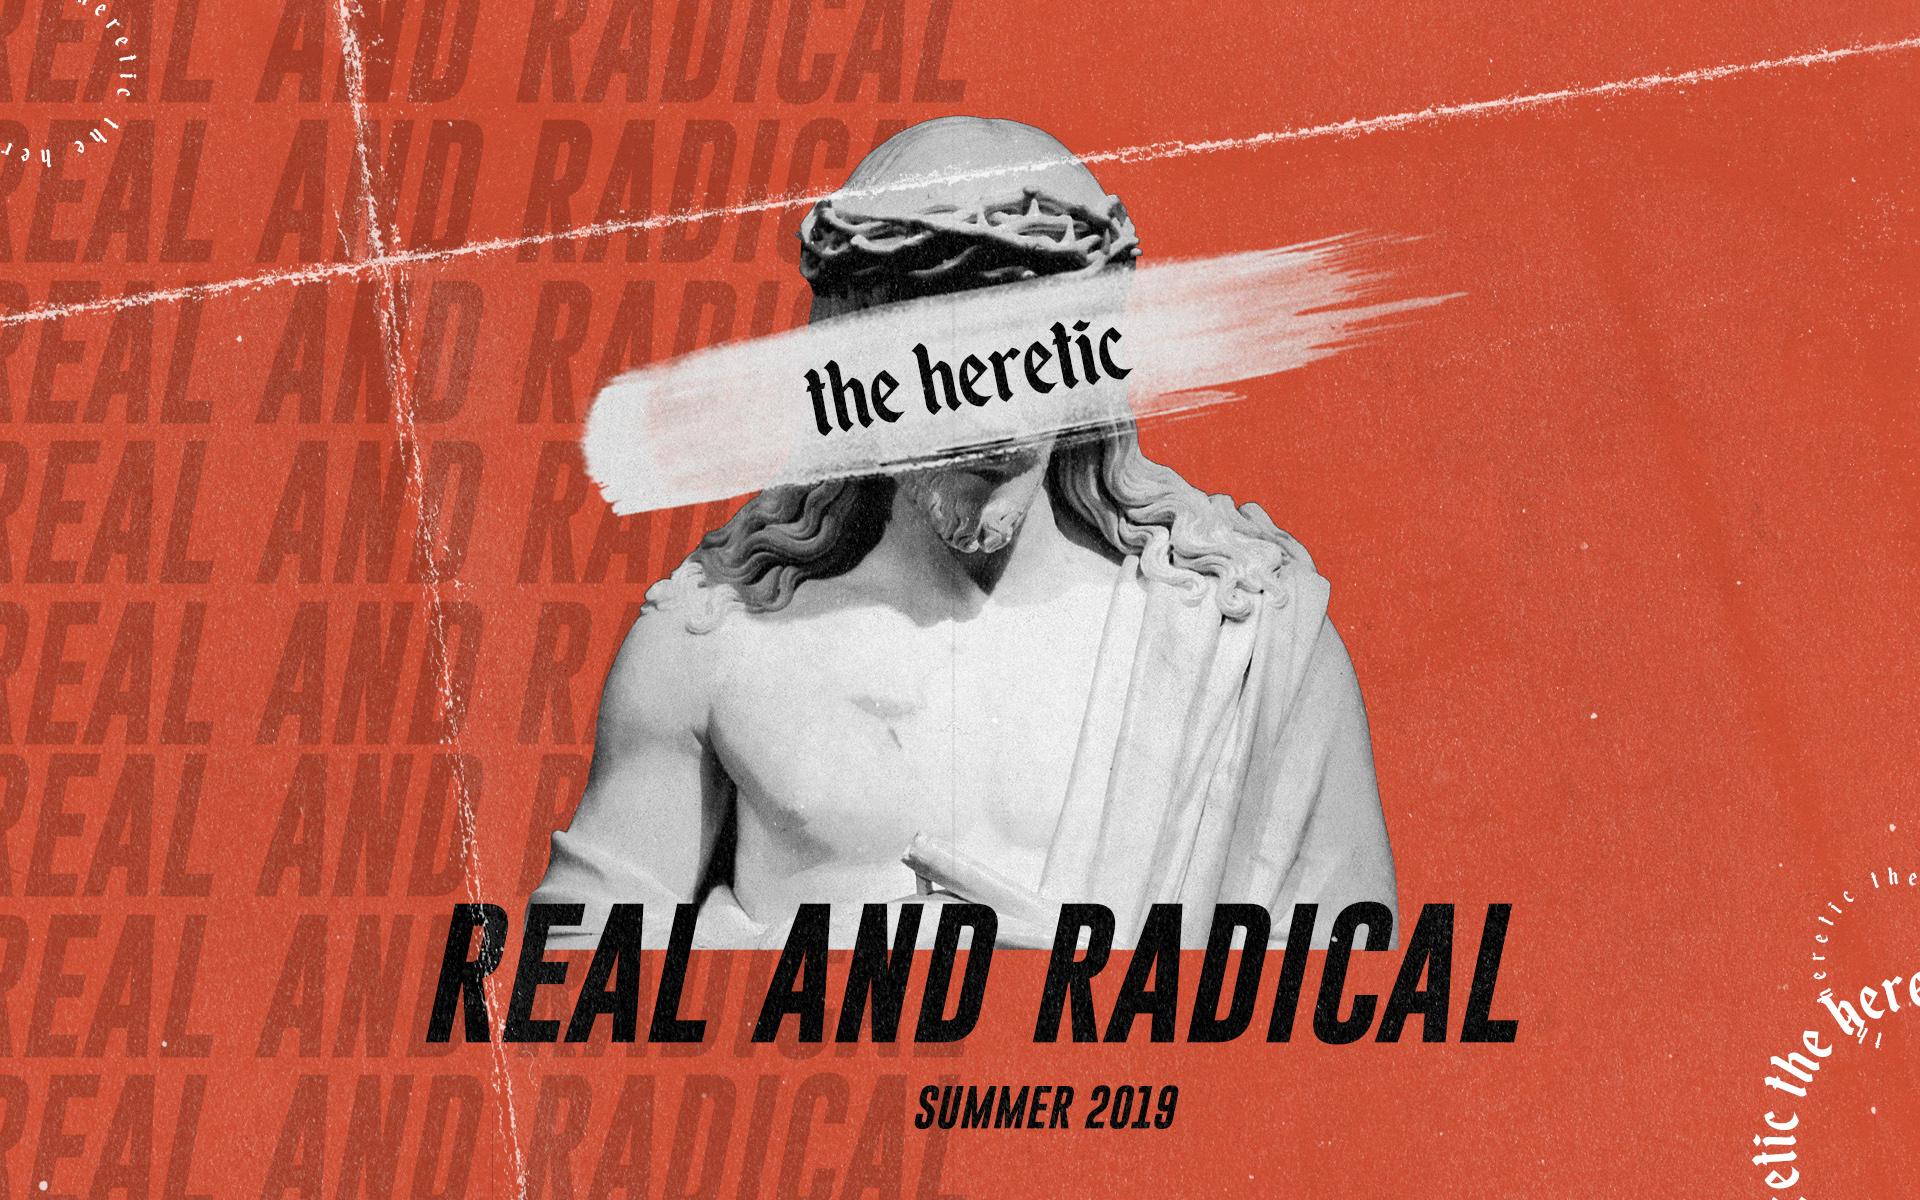 the_heretic_slide_red_2.jpg